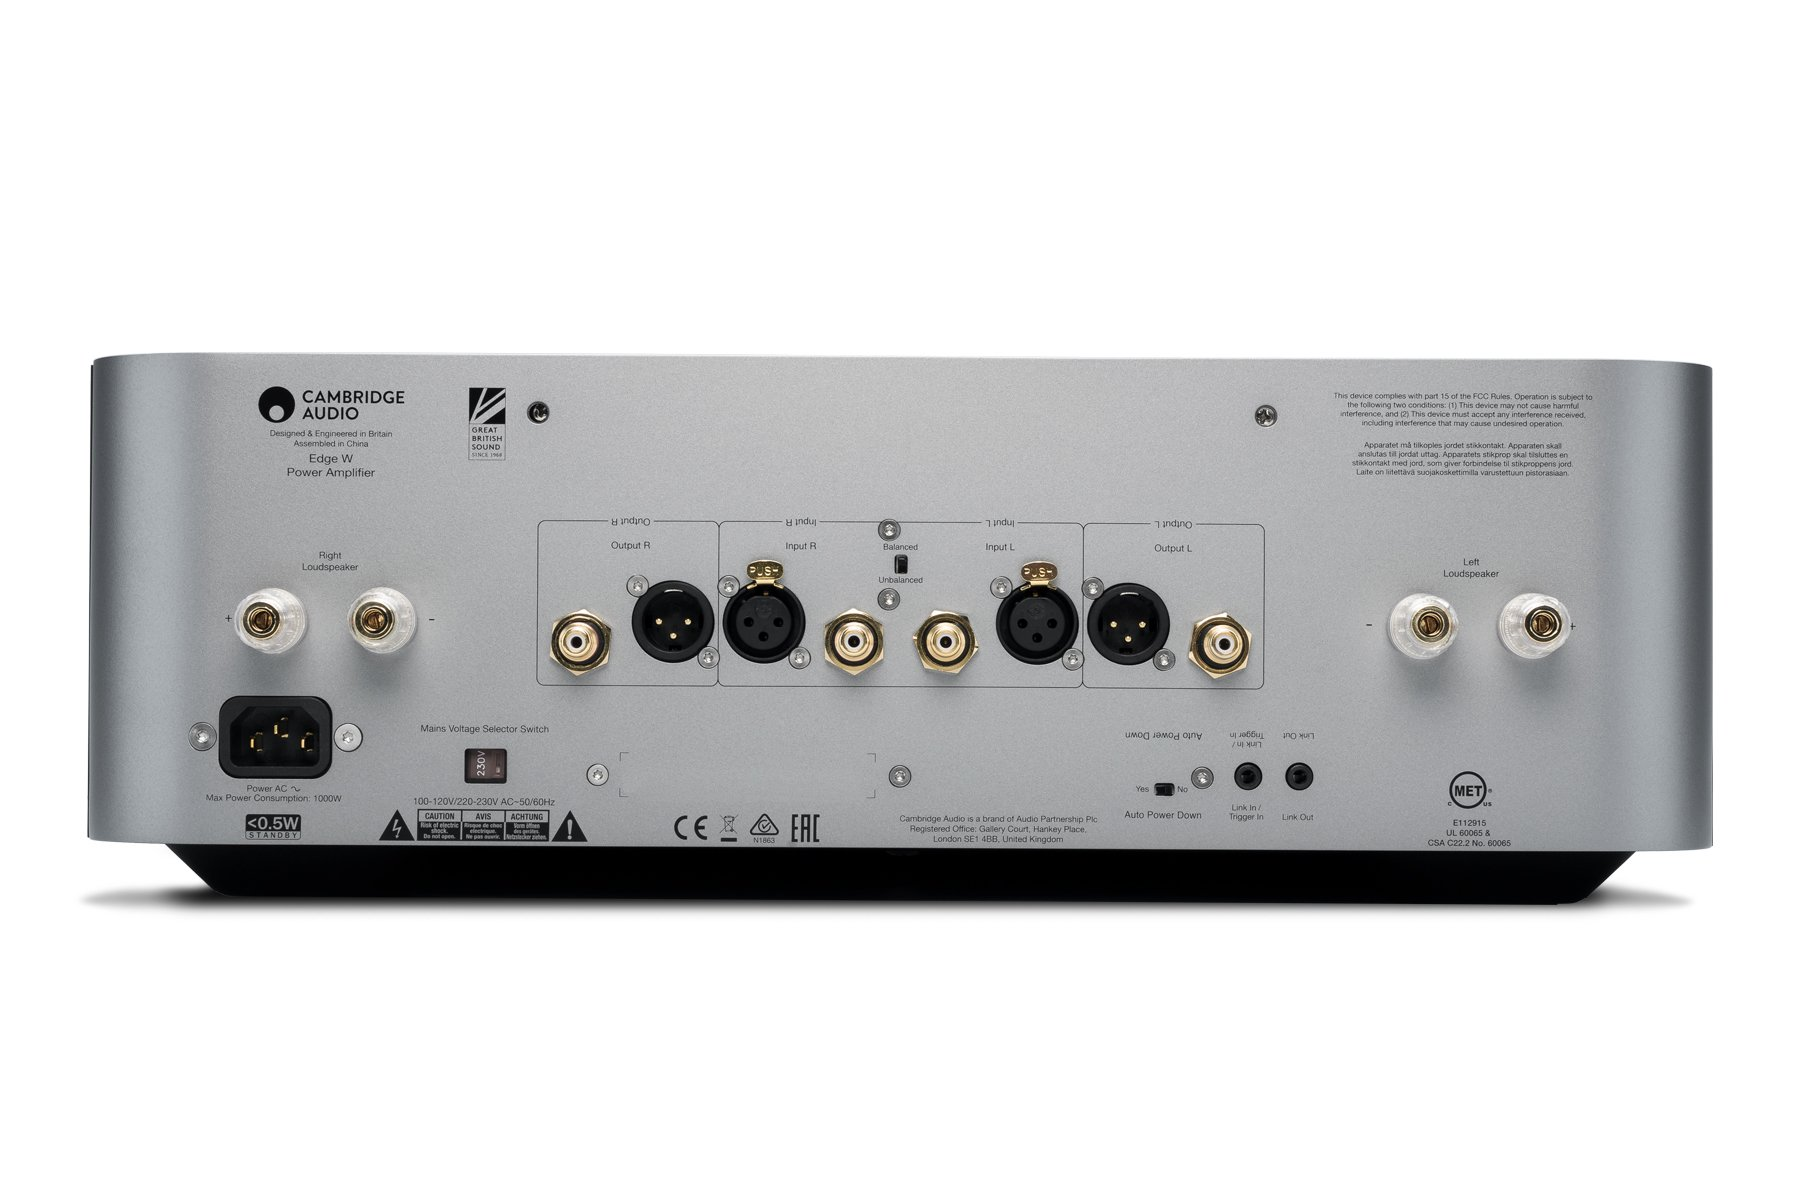 Edge W Power Amplifier Cambridge Audio Tech Specs